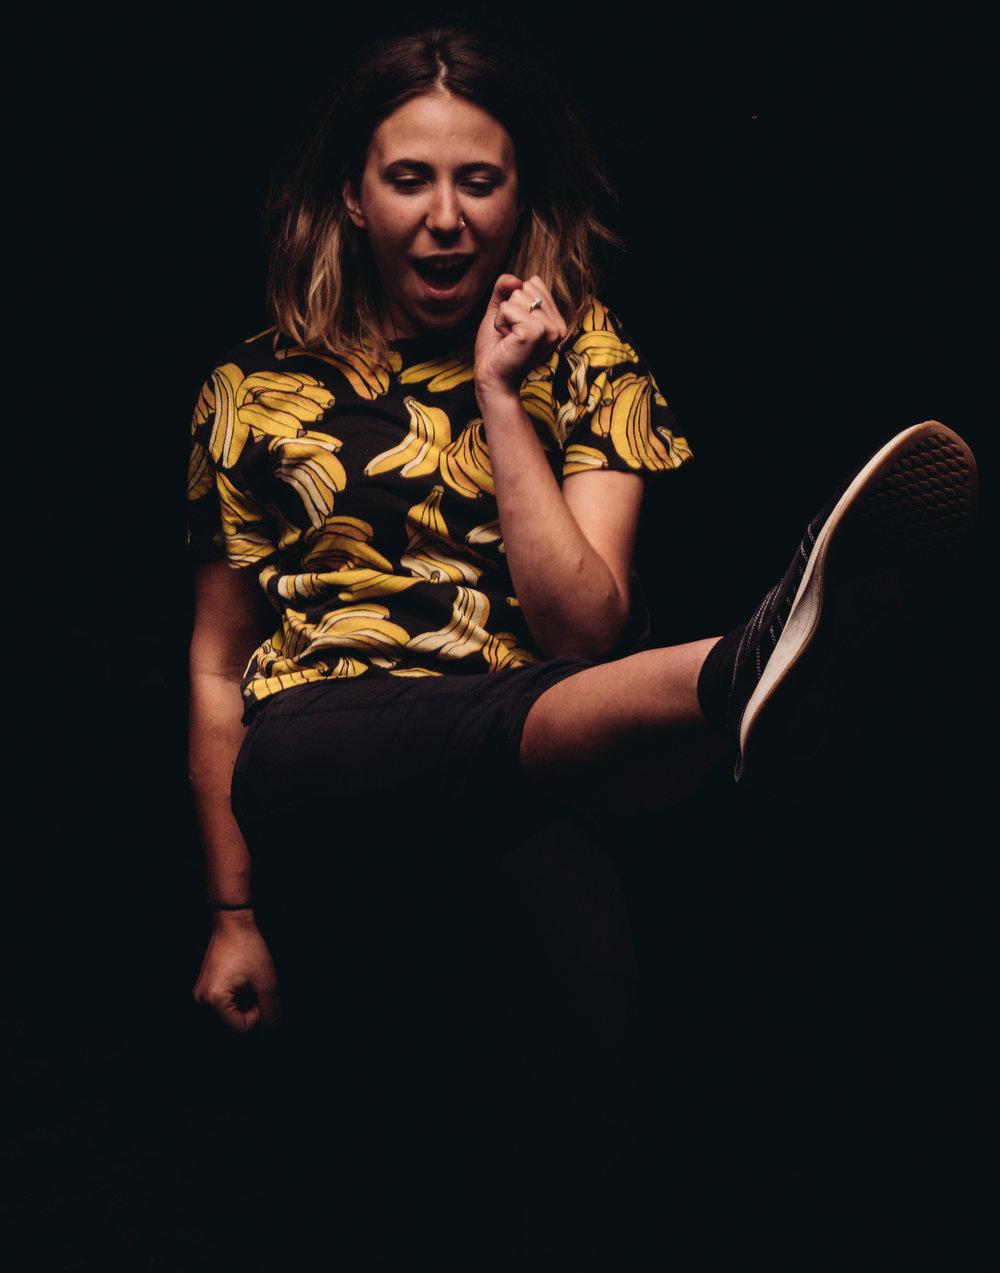 Evy Veikos    Kicking Ass - Moving forward